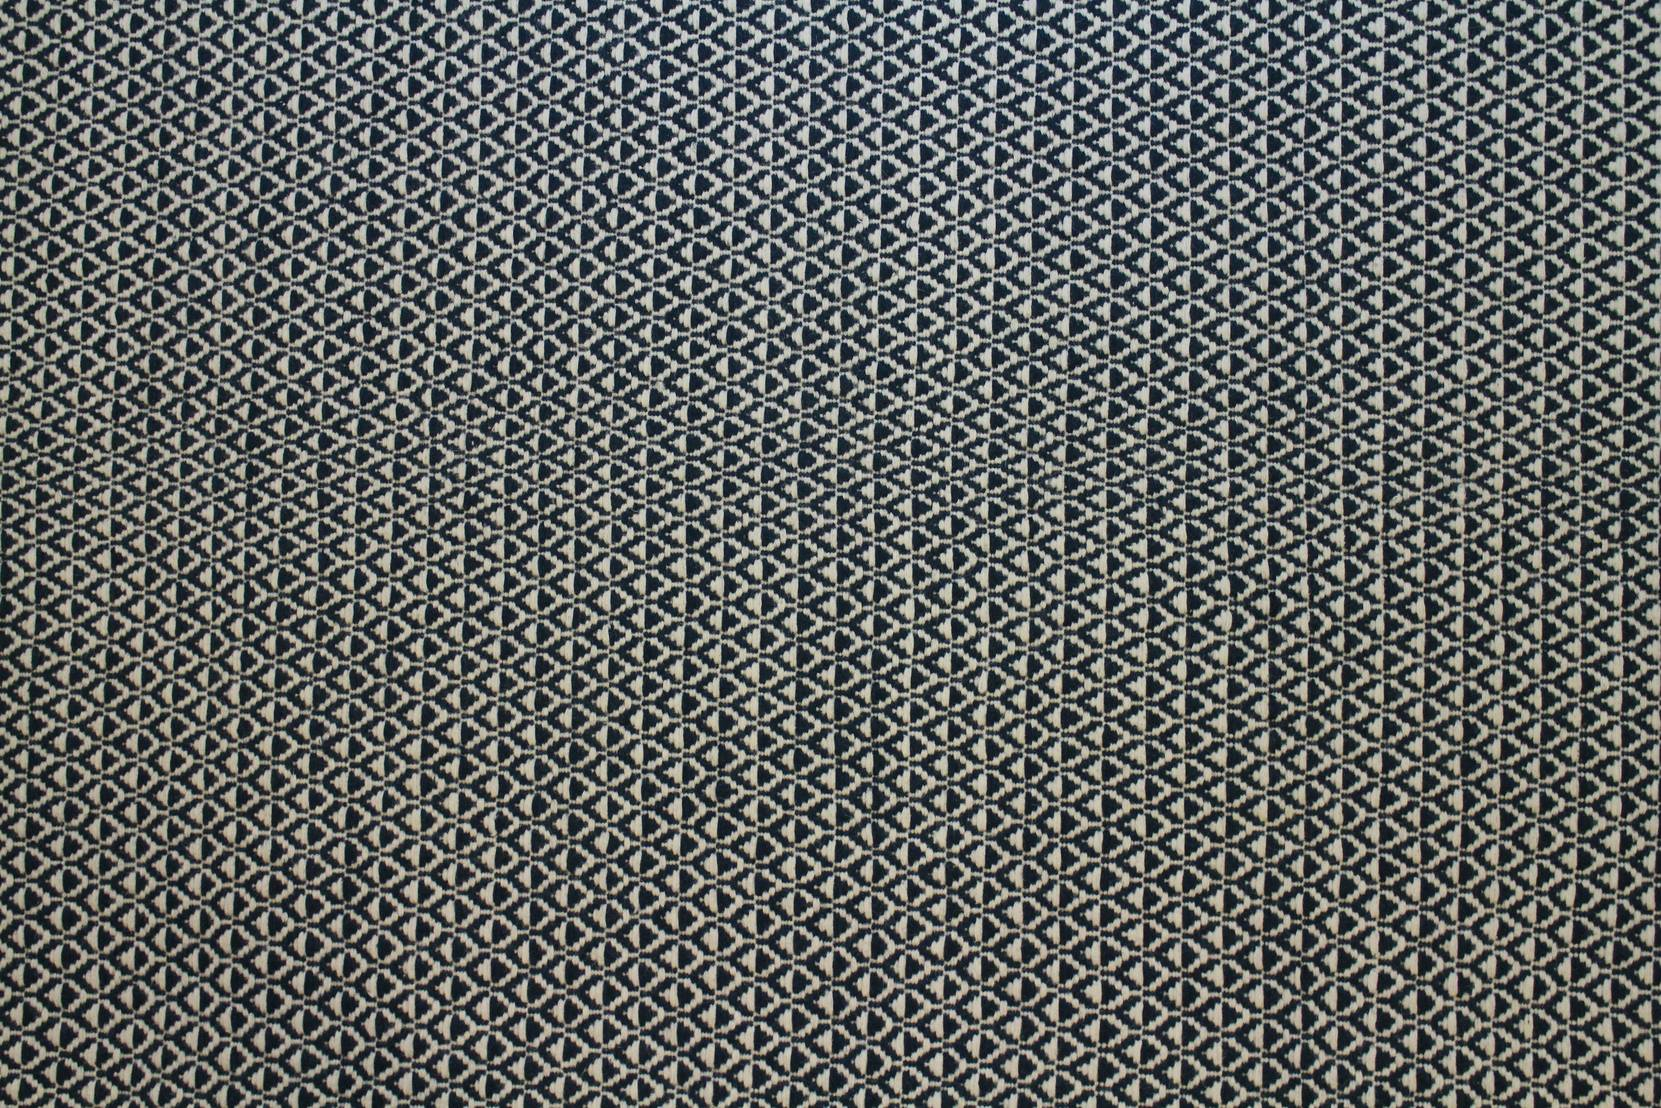 Kiko-matto 200x300 cm